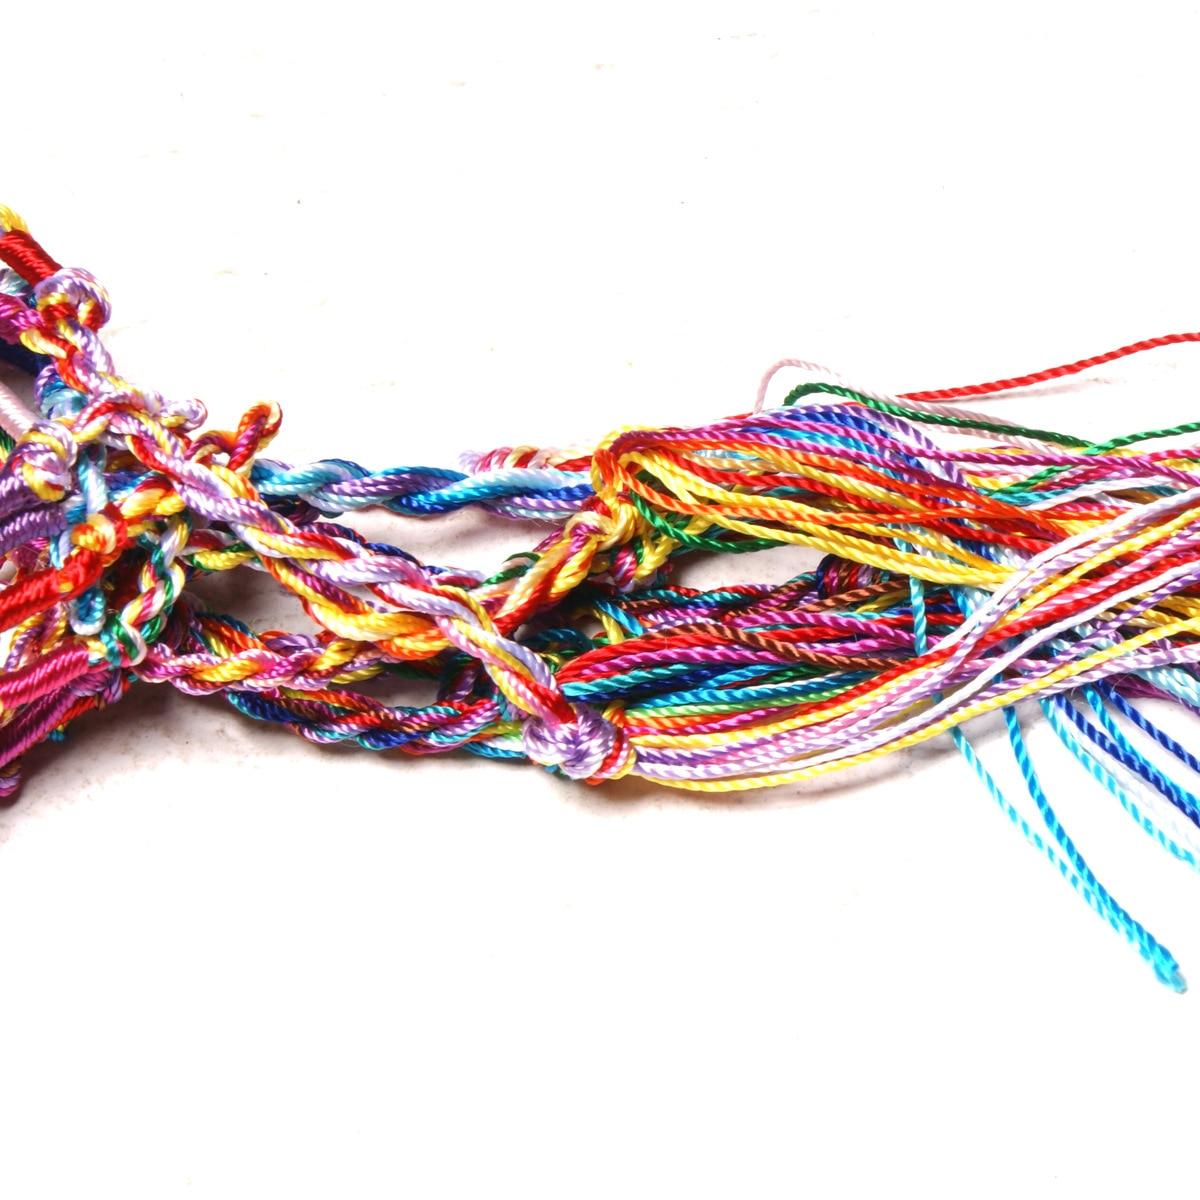 10pc Colorful Woven Braided Friendship Bracelet Handmade Brazilian String Cotton Cord Hippie Surf Men Women Jewelry Gift 3